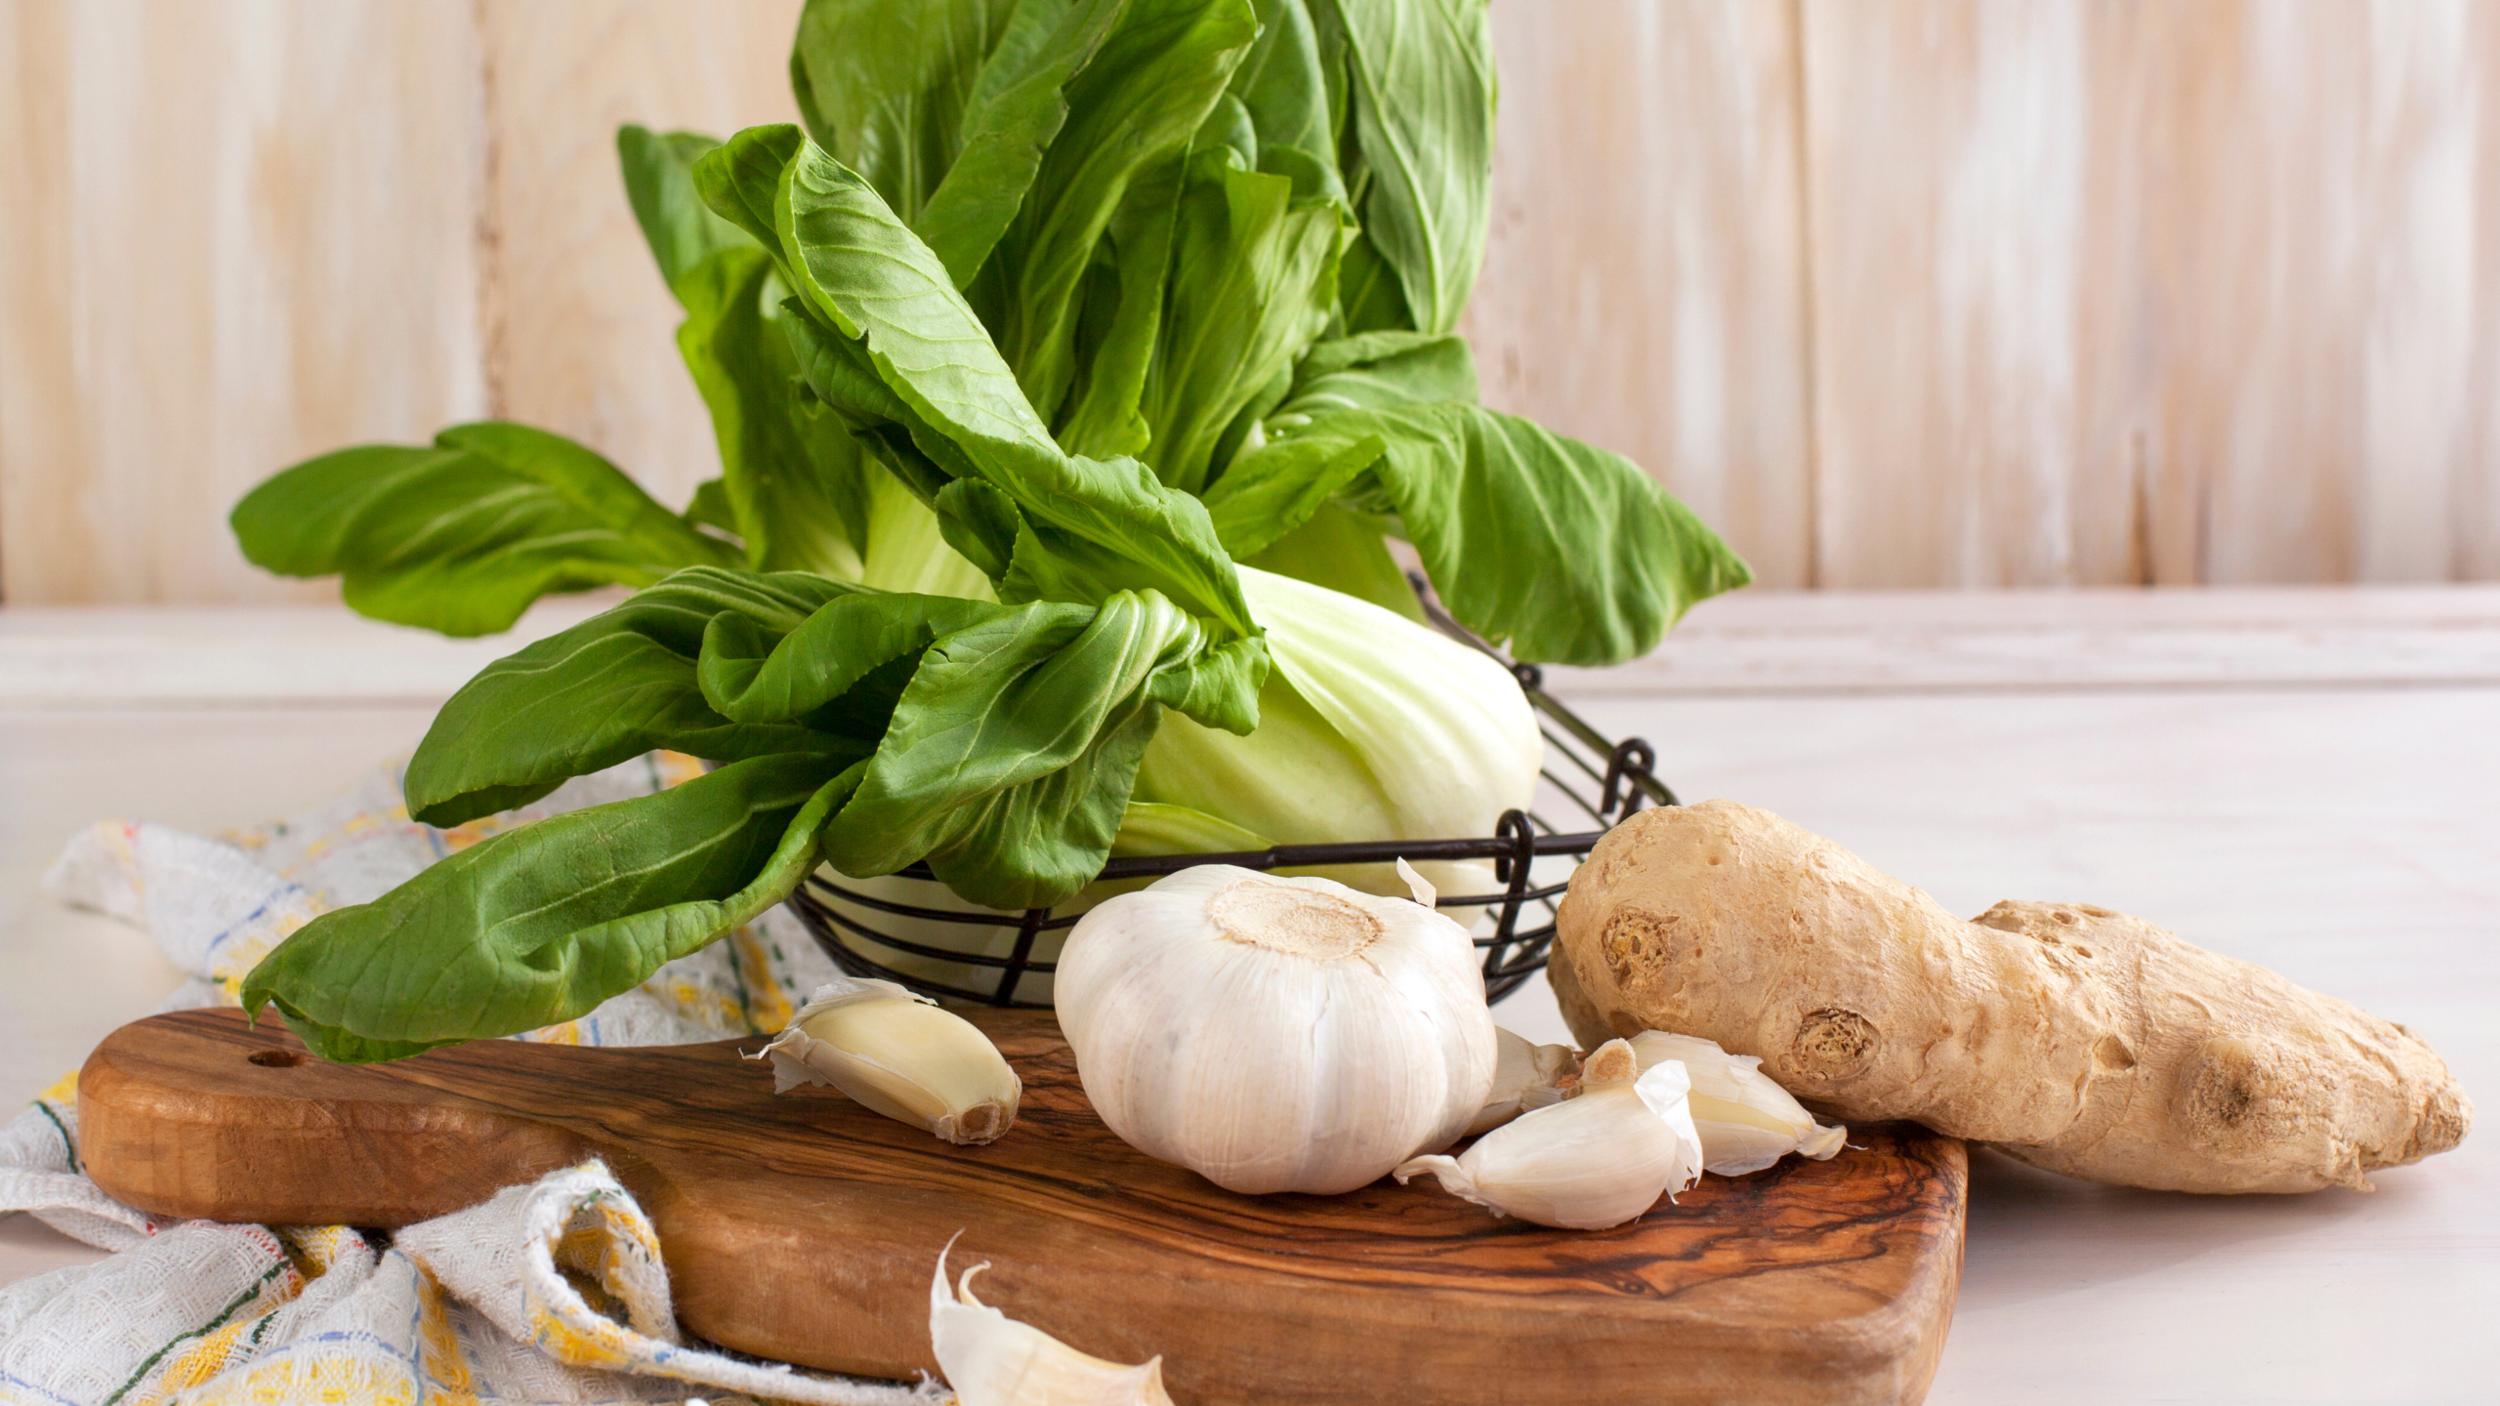 Ingredients to prep for the healthy ramen soup, Hanoi Ramen.